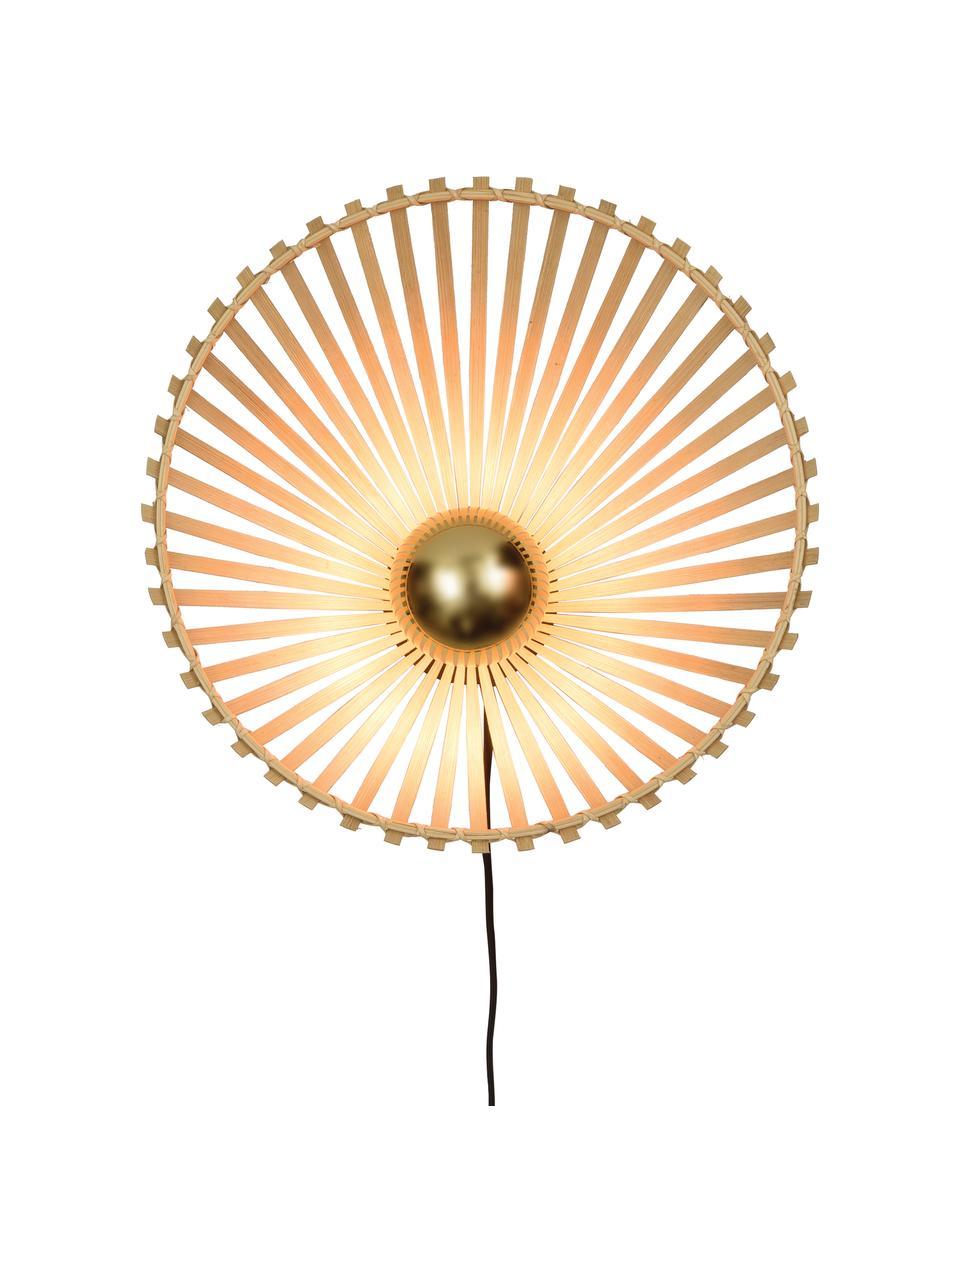 Wandlamp Bromo met stekker, Lampenkap: bamboe, Beige, zwart, Ø 40 x H 40 cm